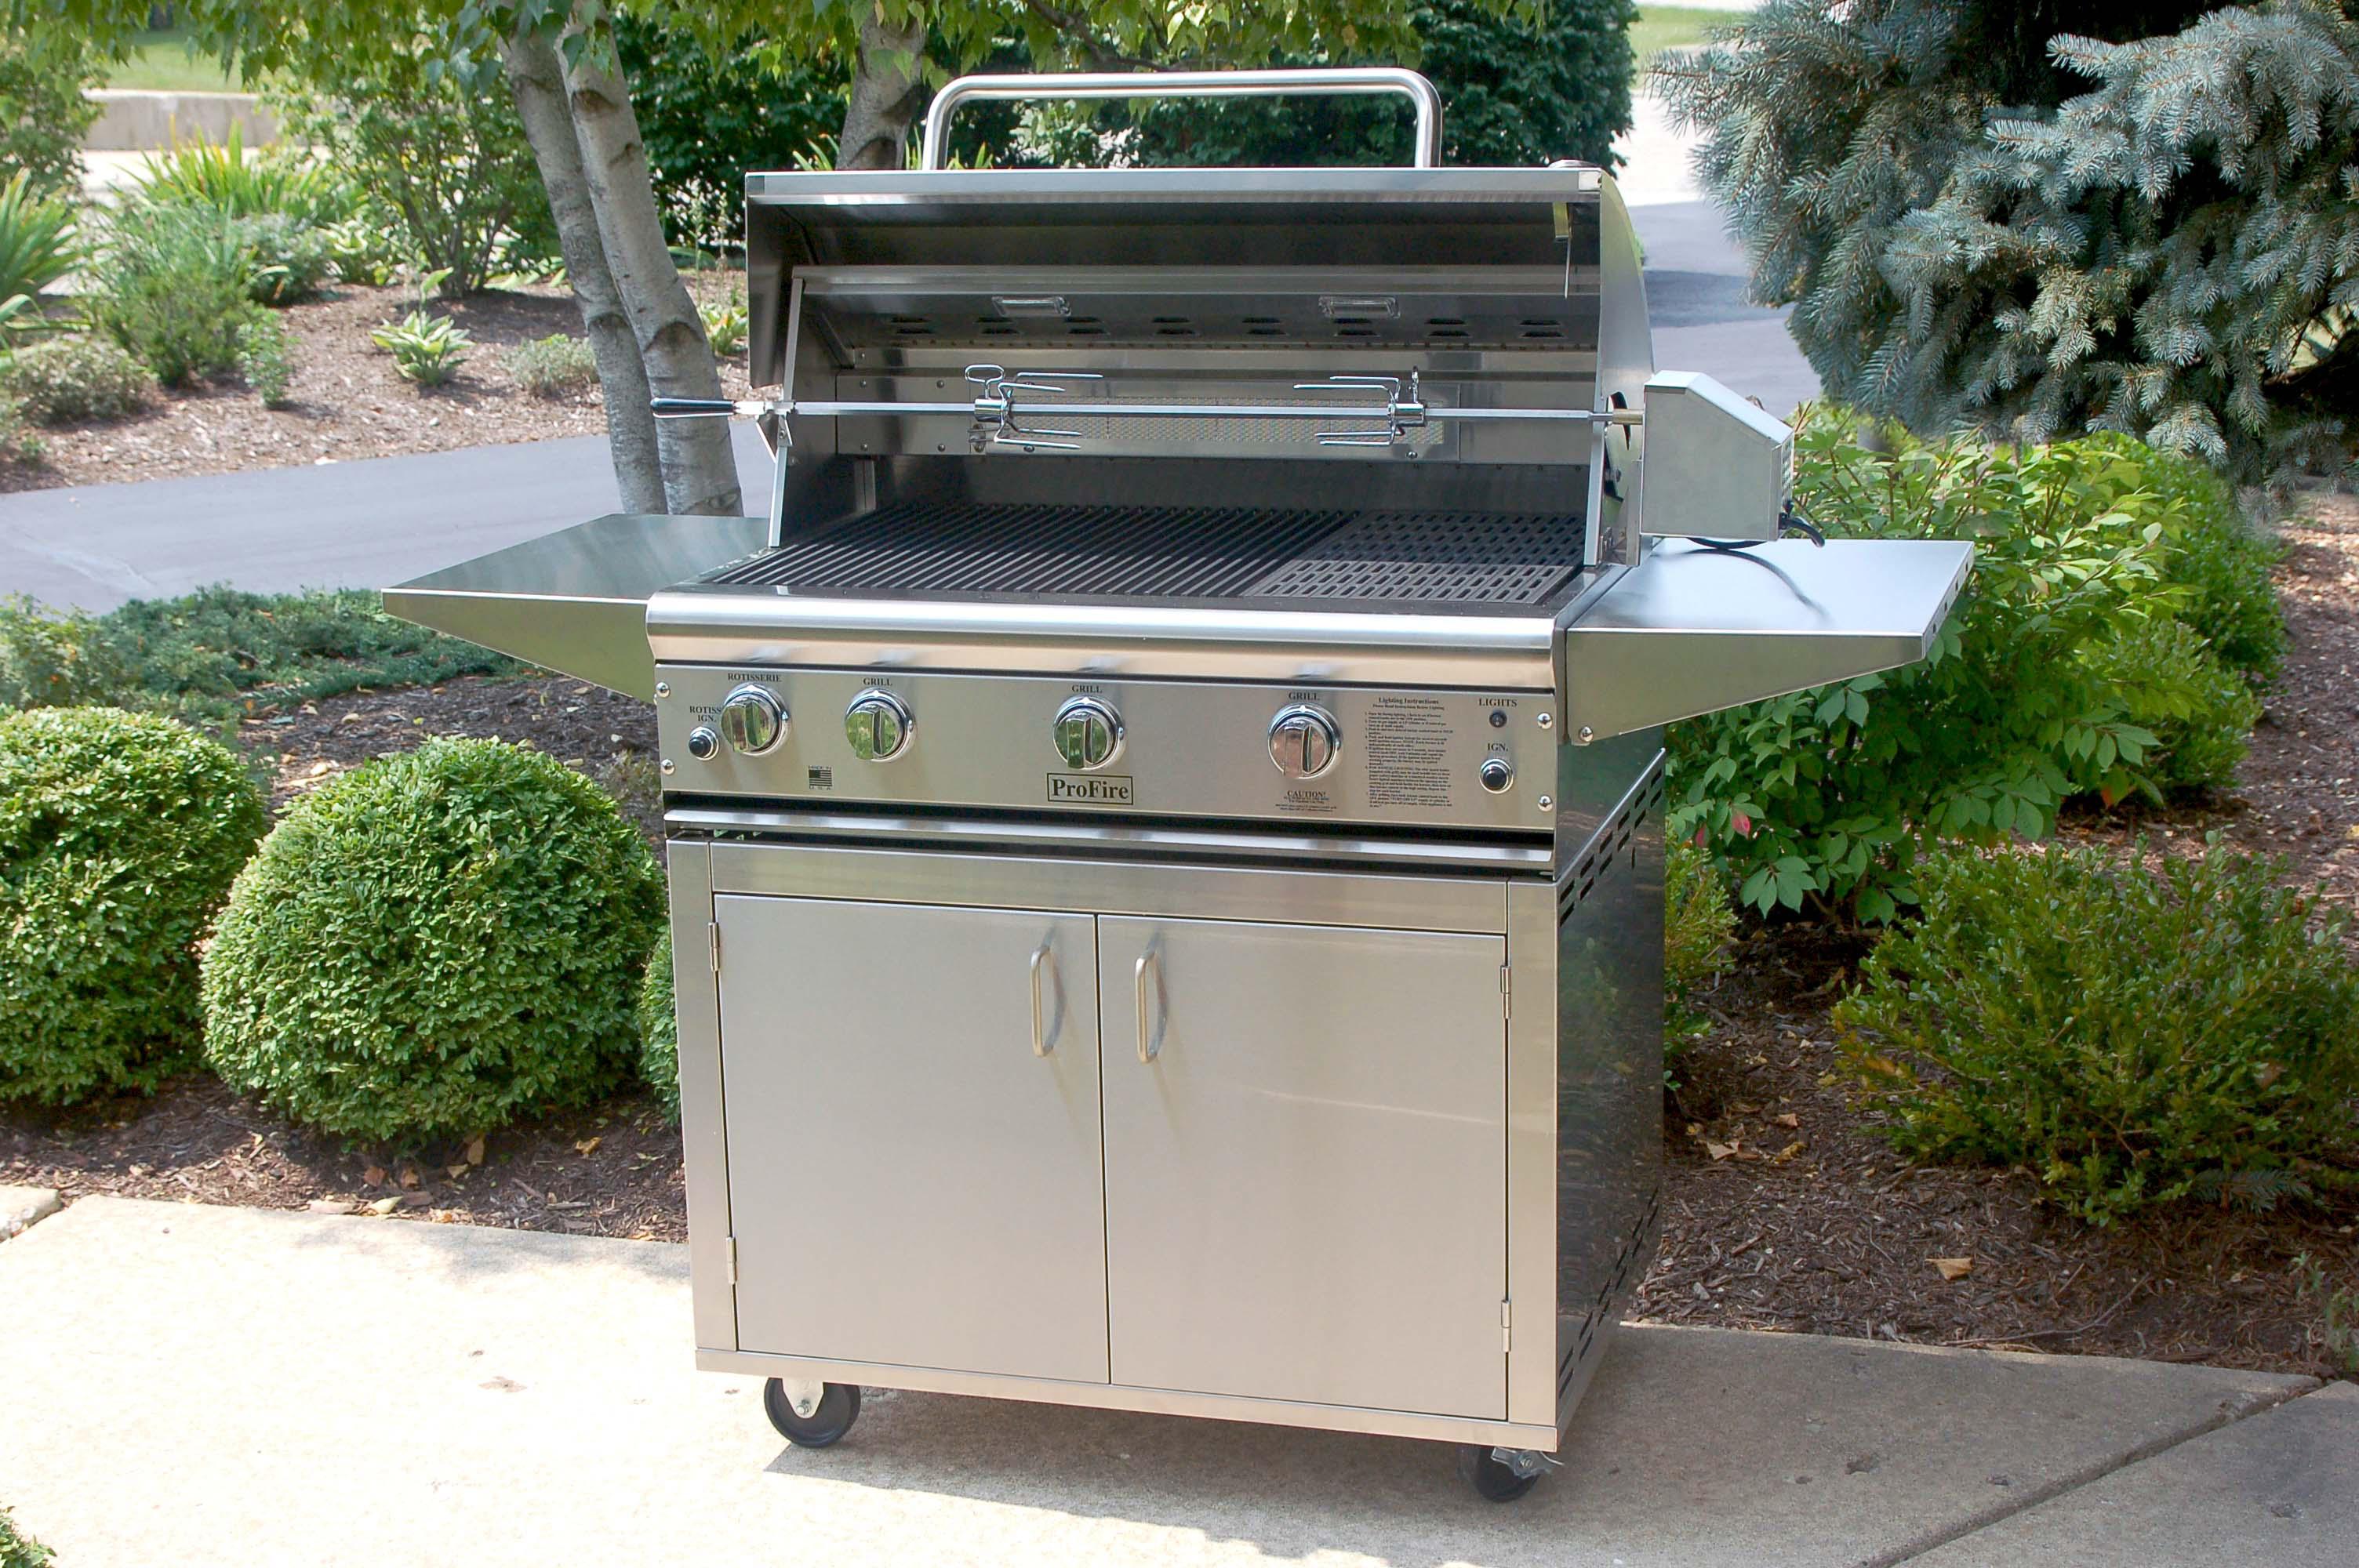 PFDLX 36 Cart Rotisserie